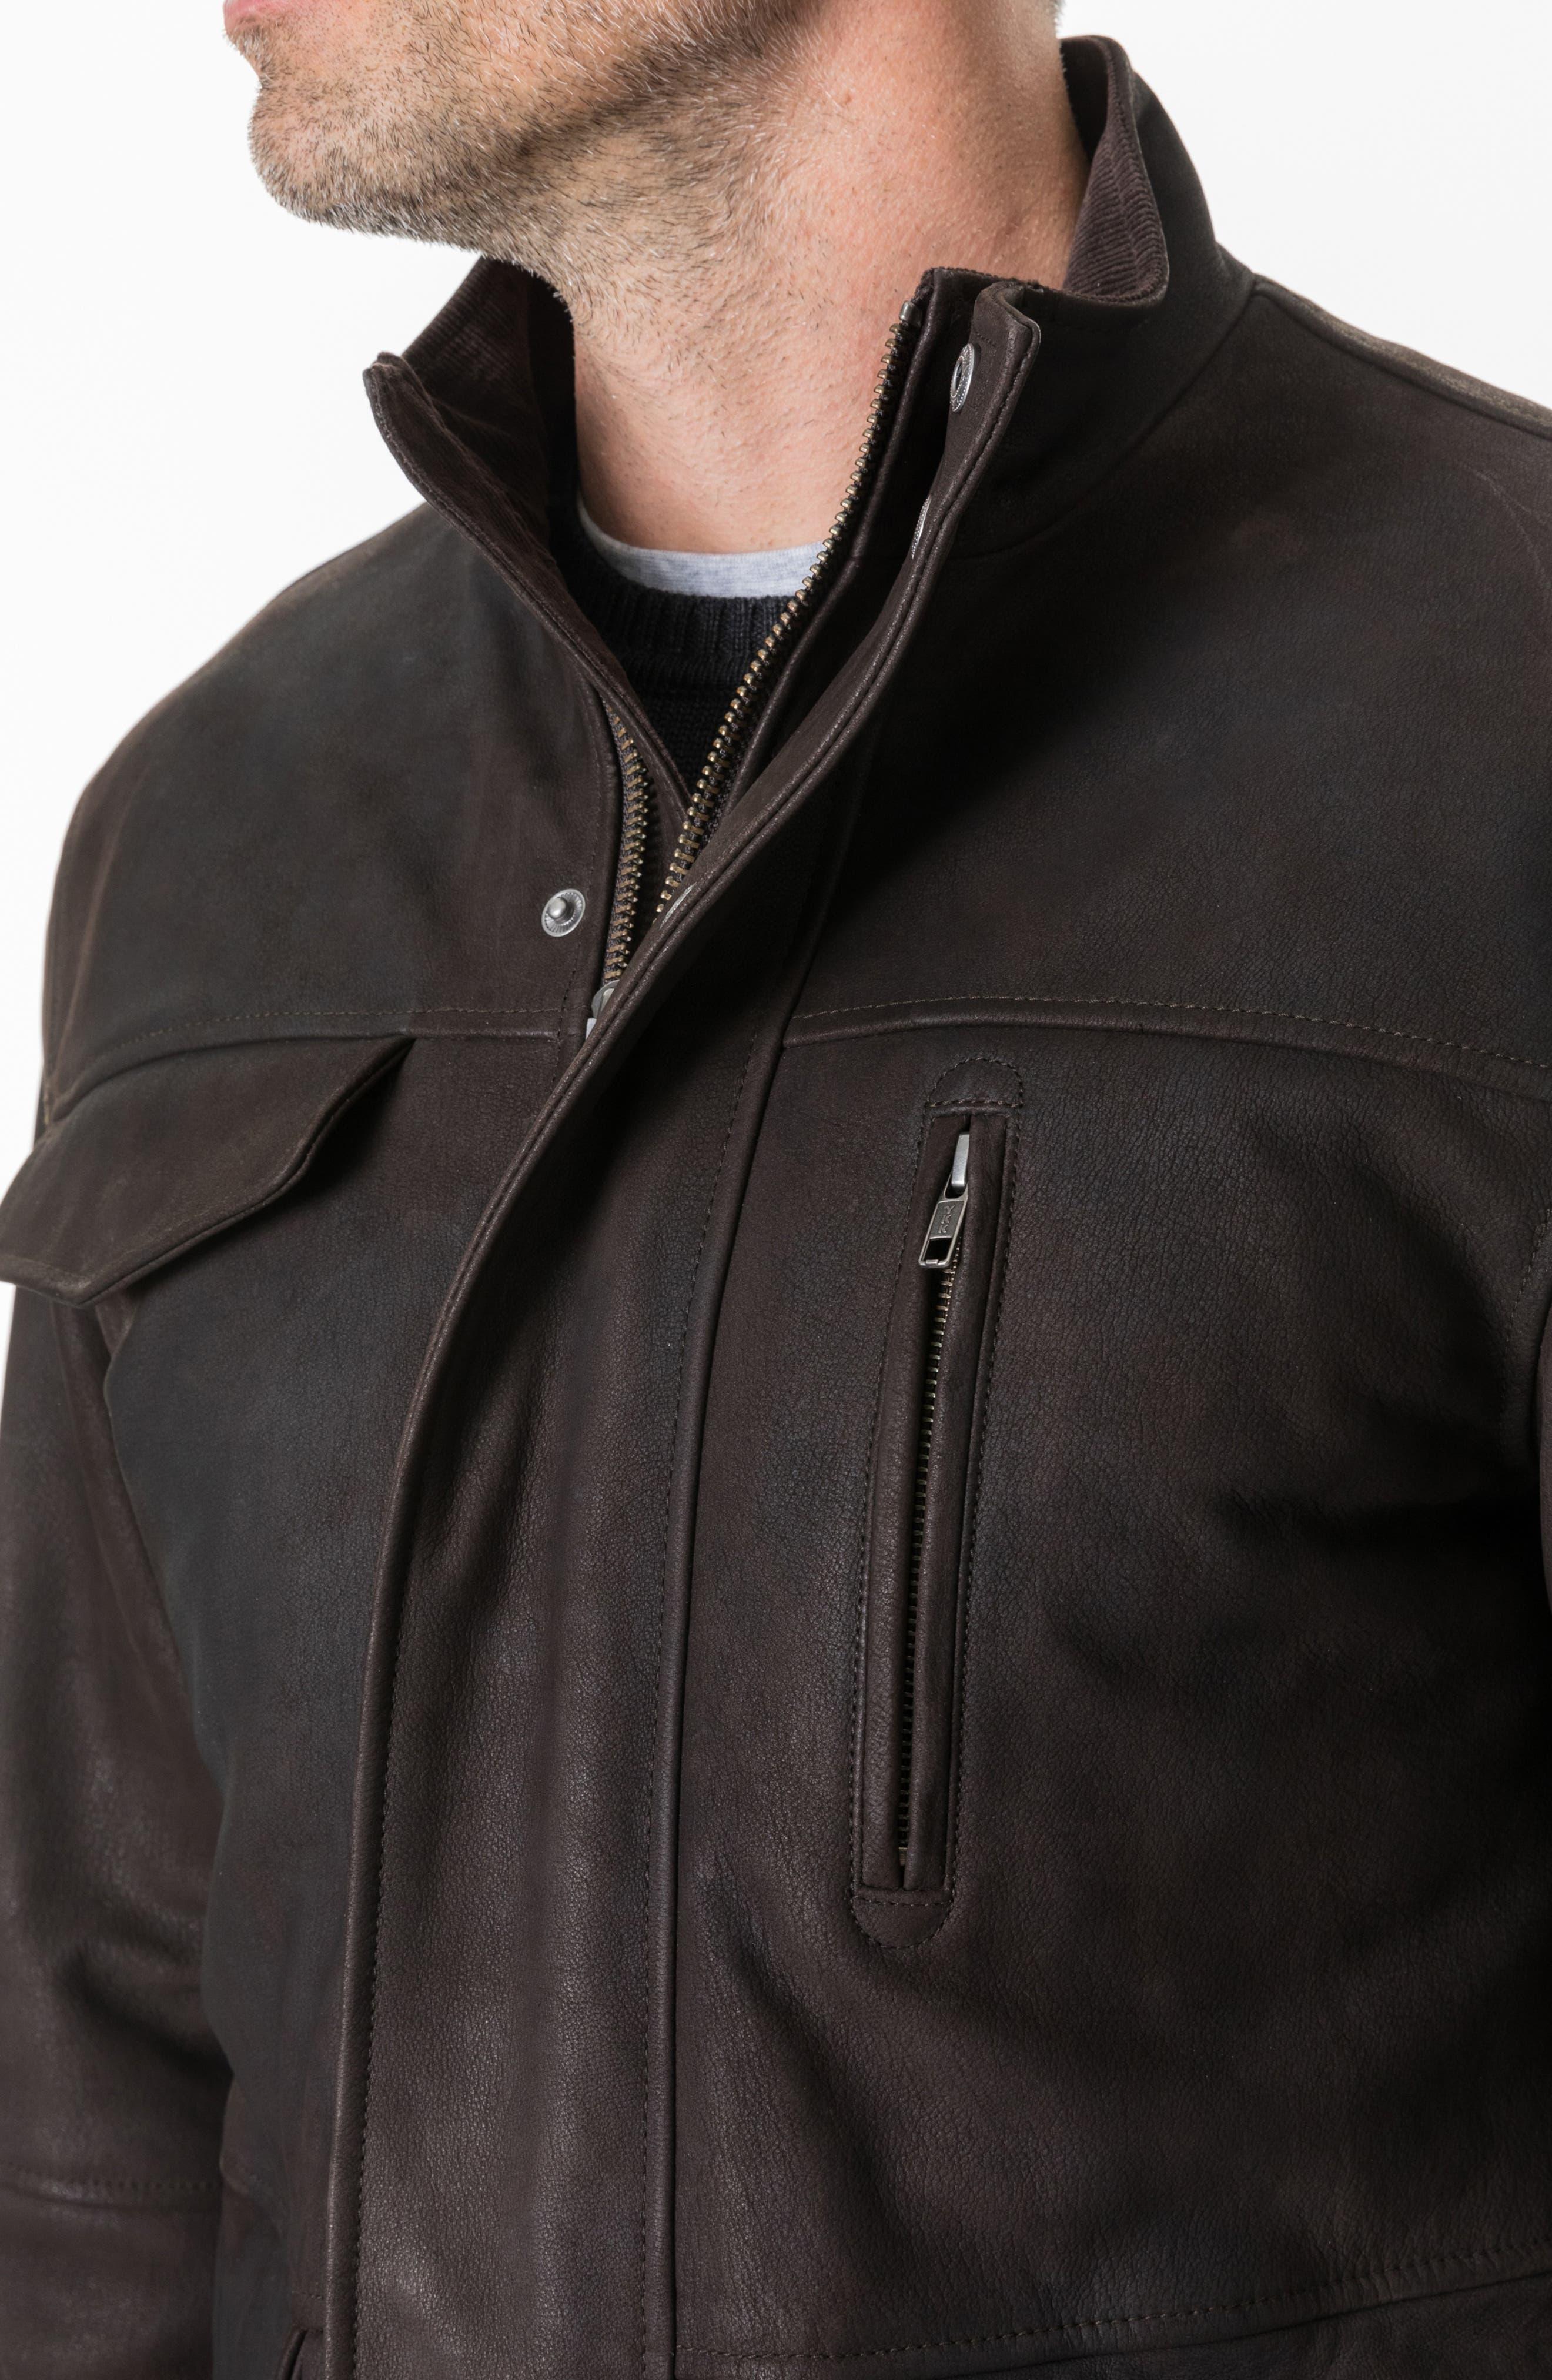 Fairholme Leather Jacket,                             Alternate thumbnail 5, color,                             CHOCOLATE